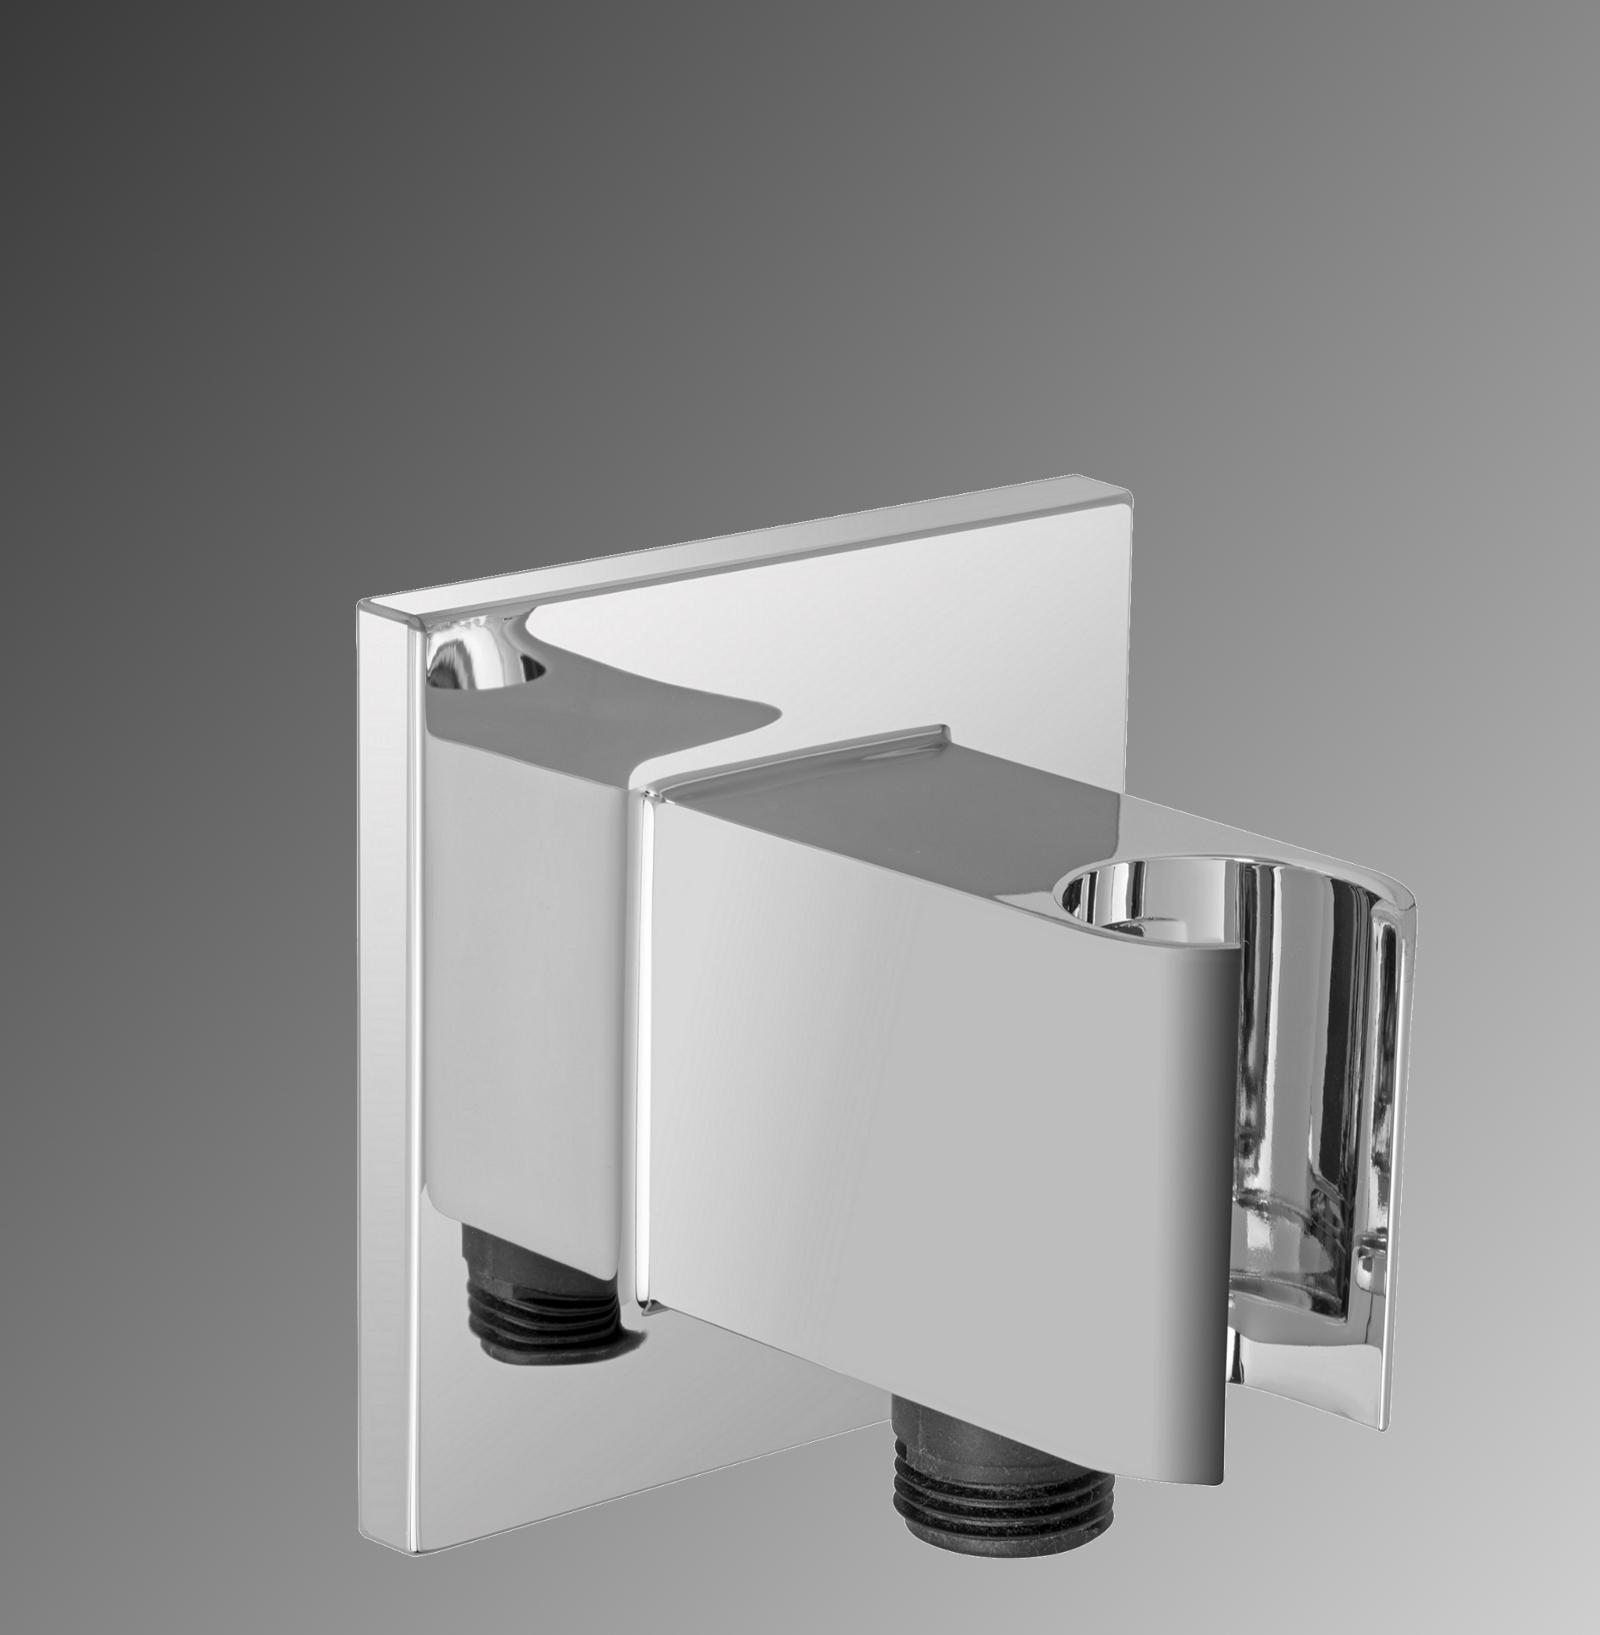 HDO-Future Technology: Rosette für Sanitärarmatur